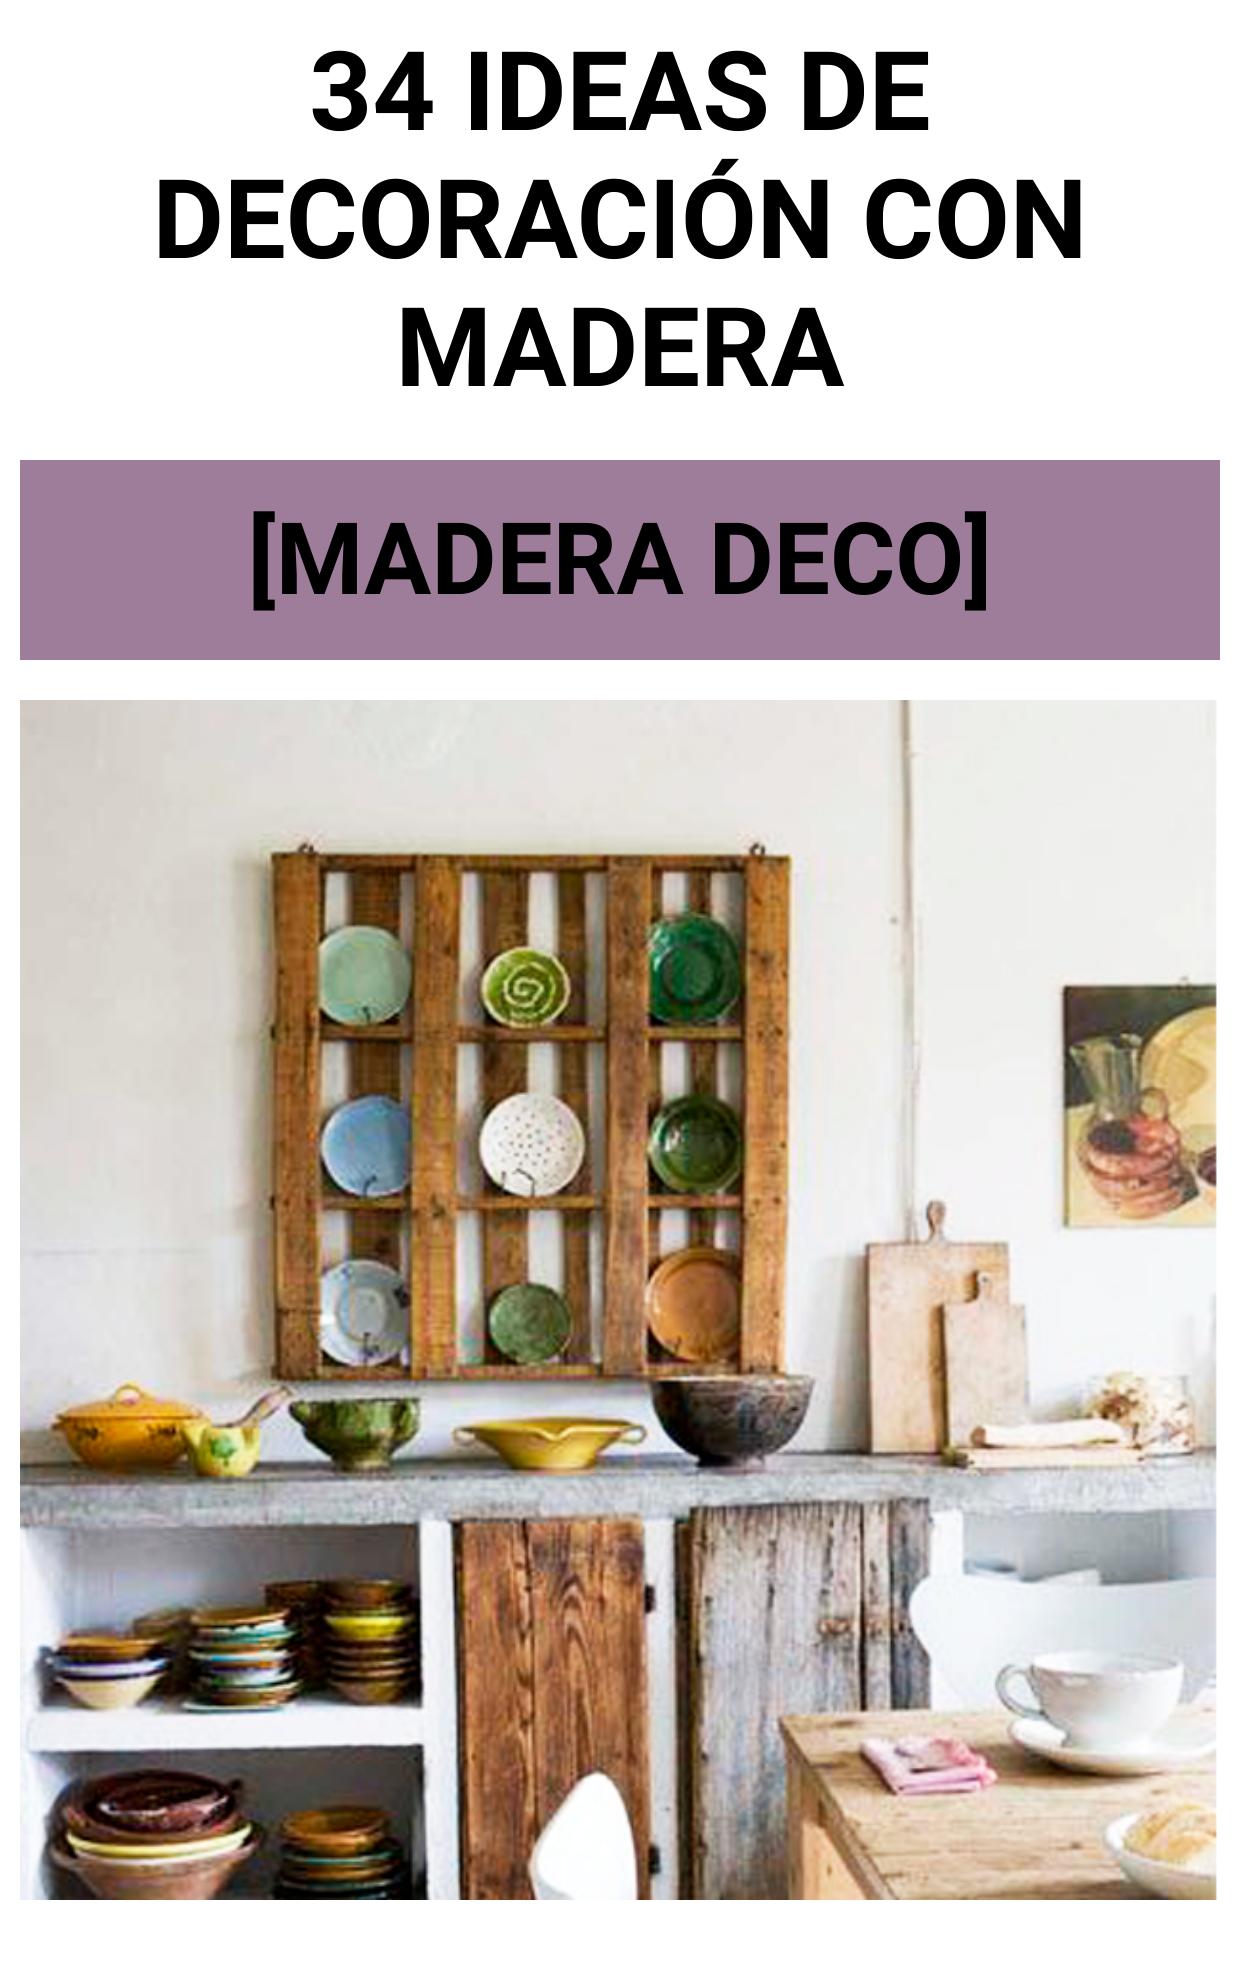 34  Ideas de decoración con MADERA